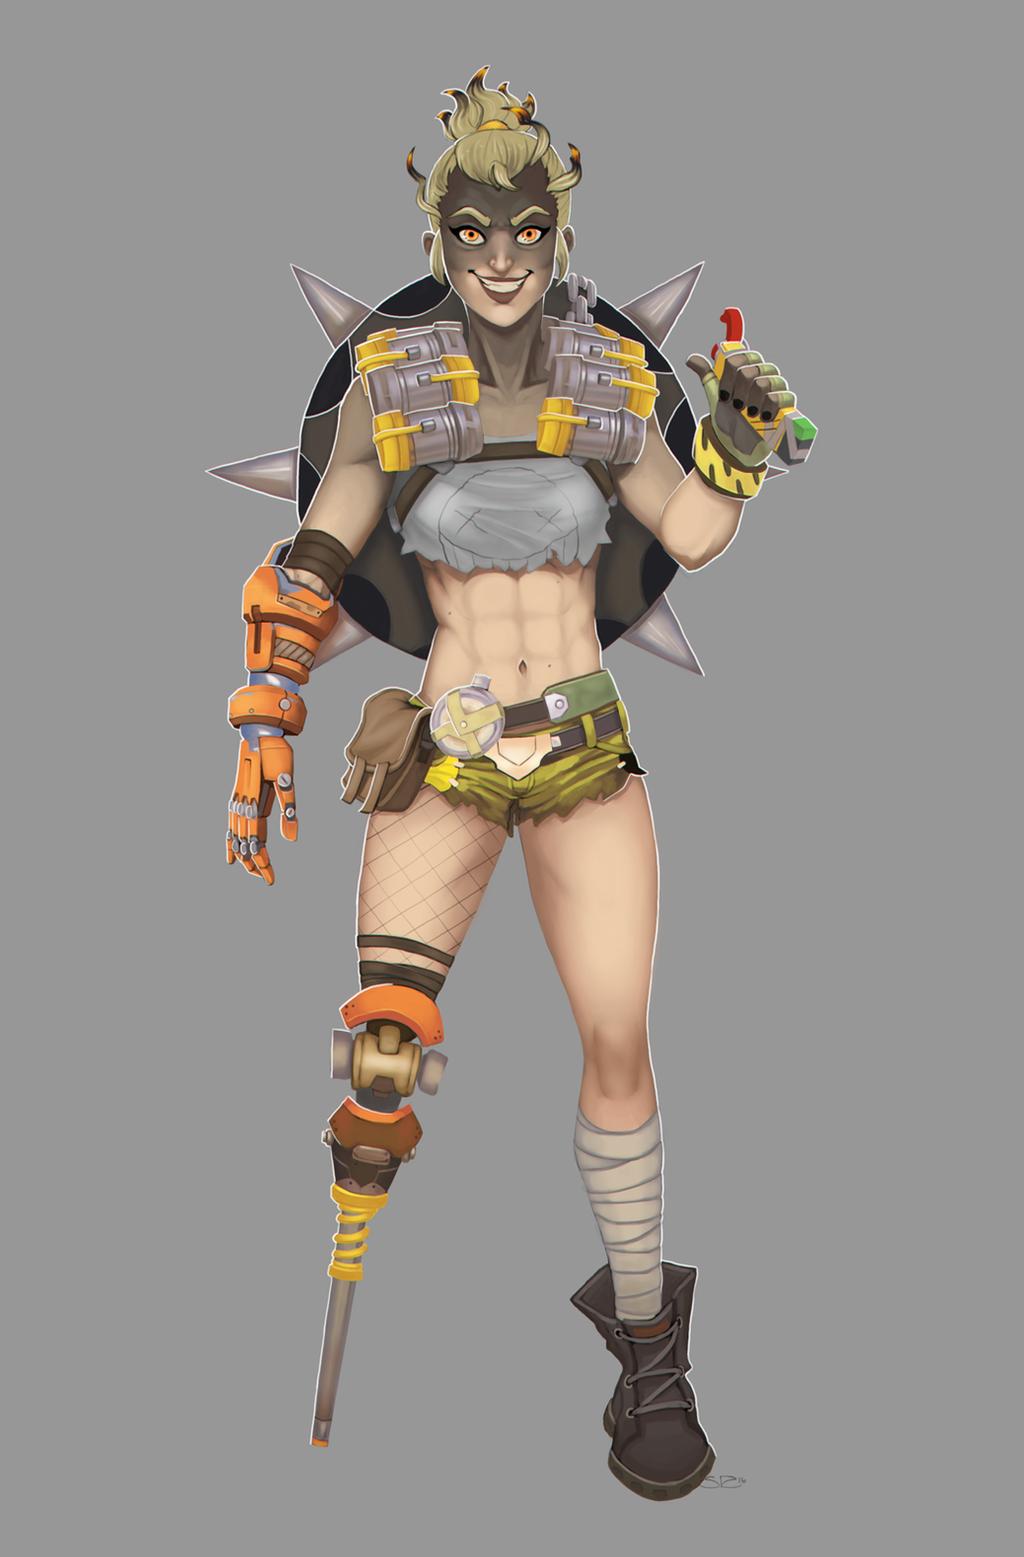 Overwatch - Lady Junkrat by SuperKusoKao